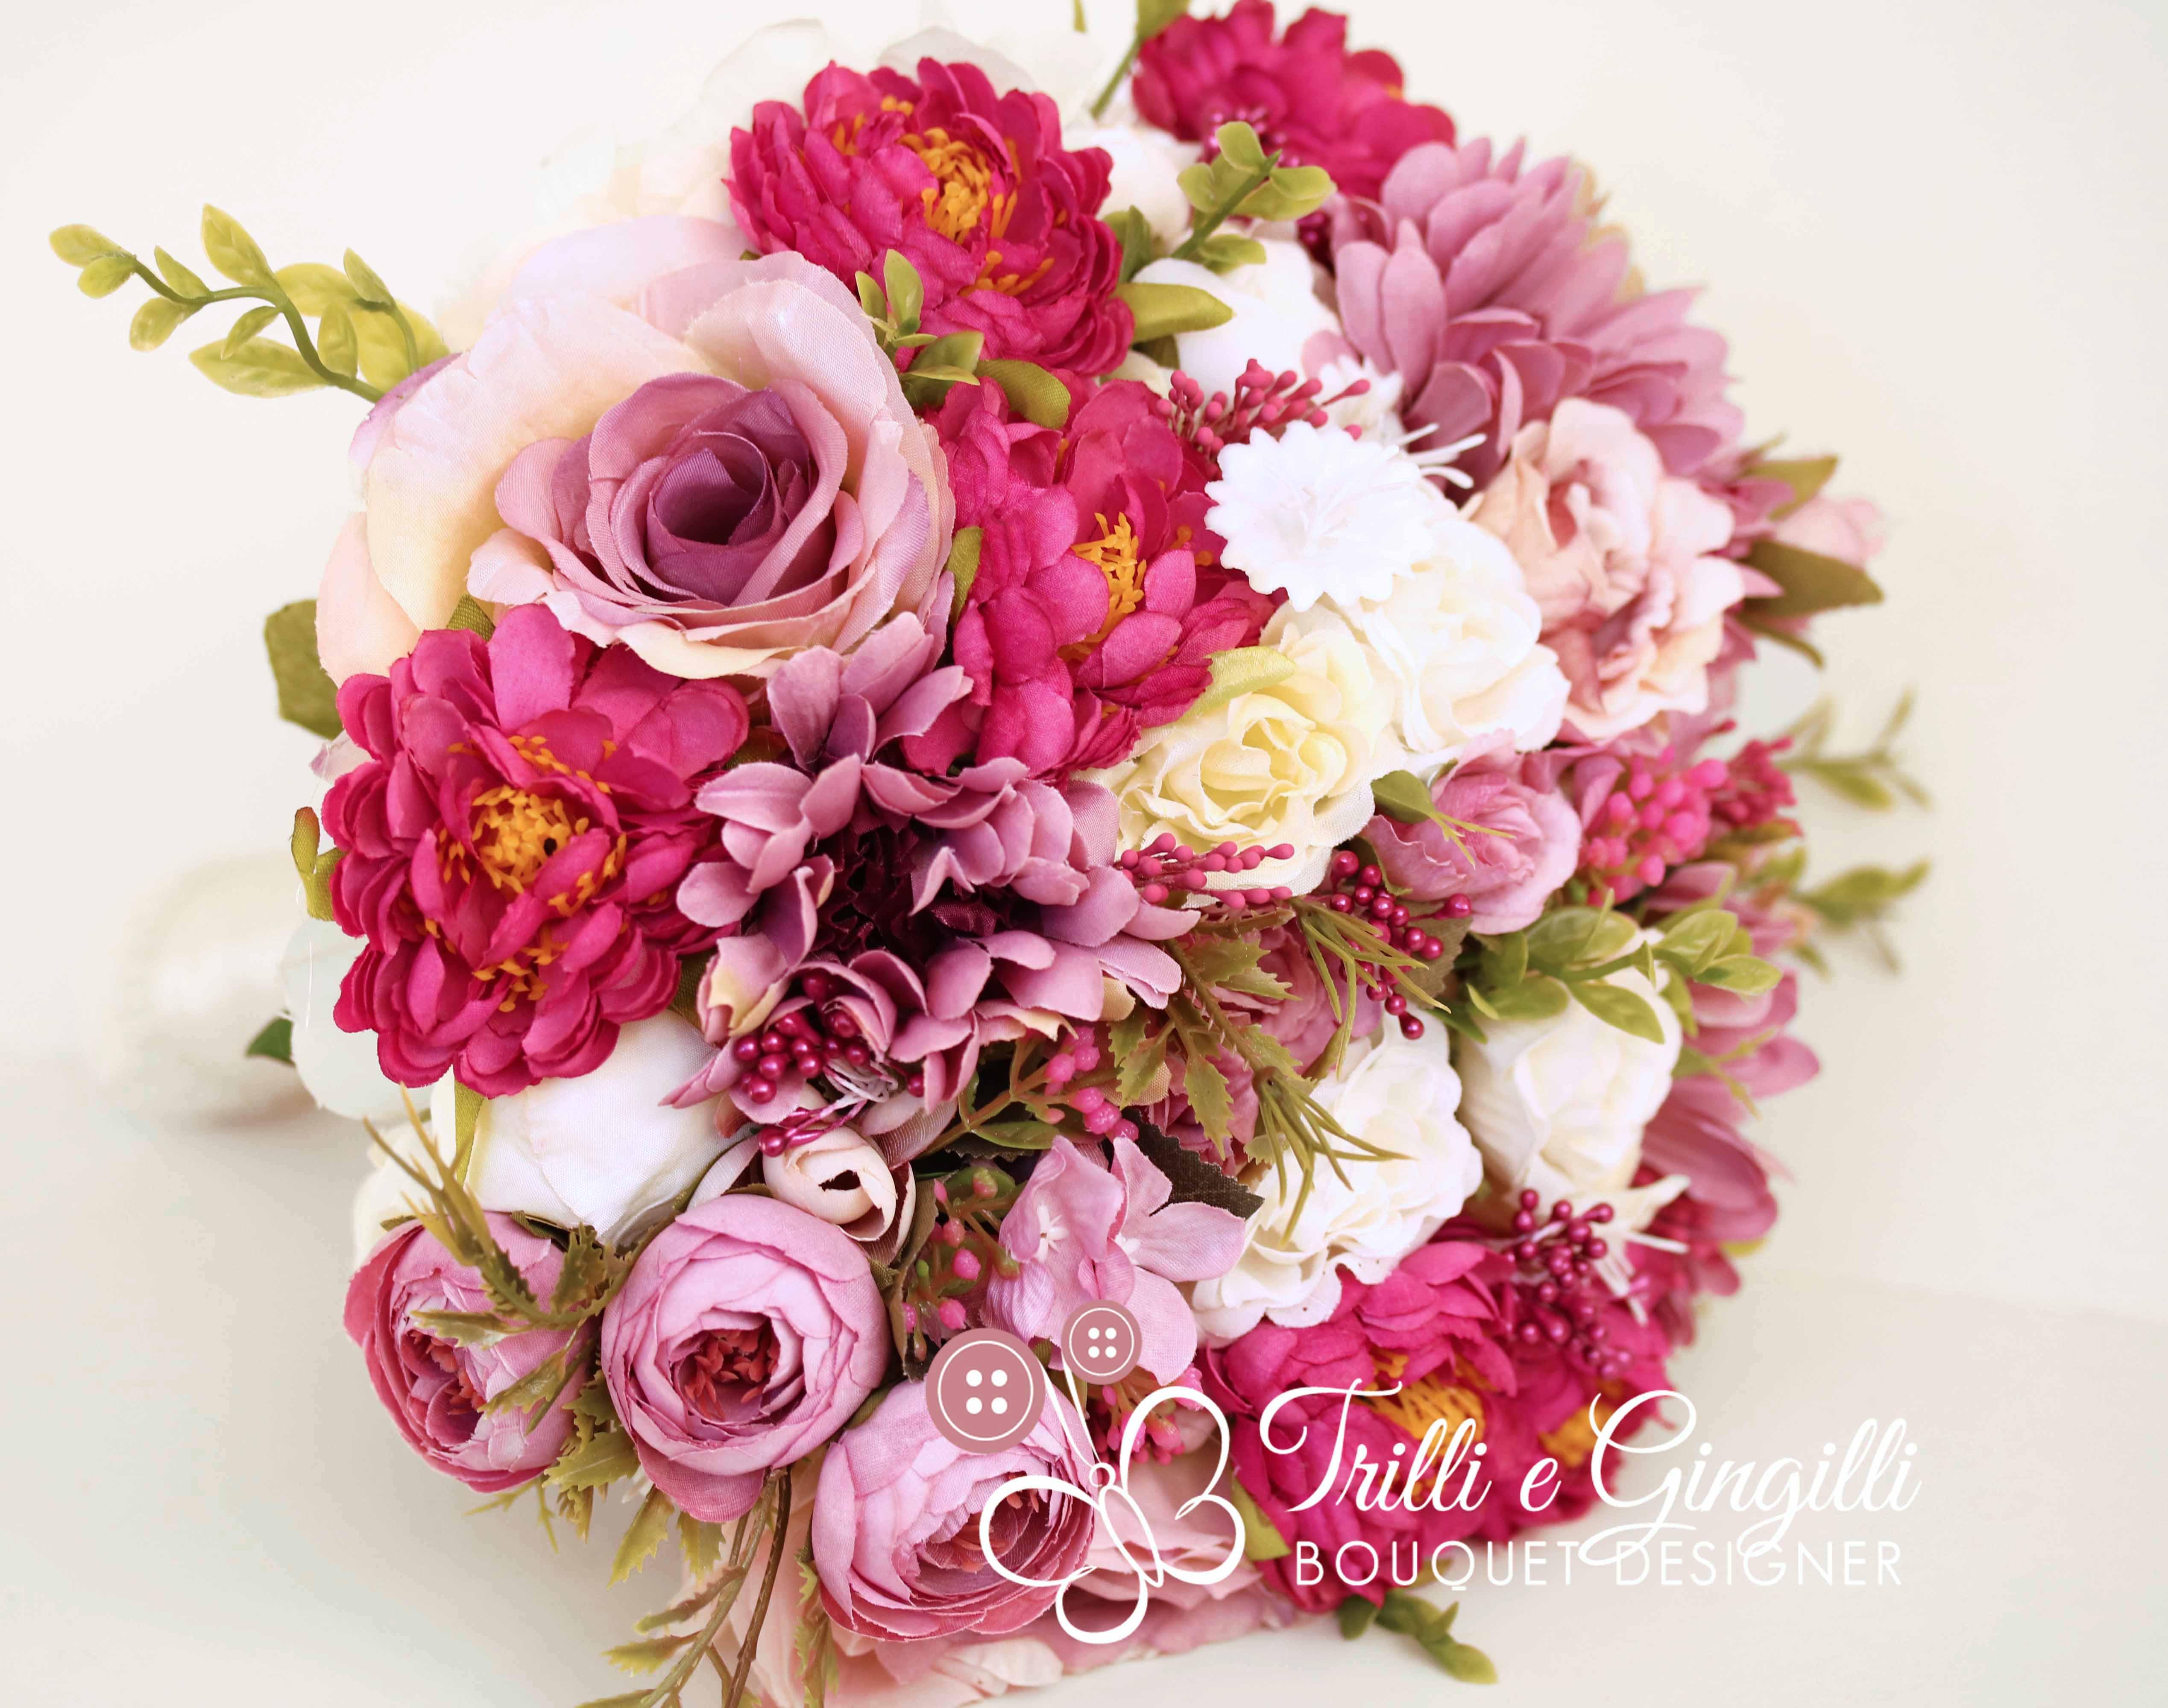 Bouquet Sposa Fucsia.Bouquet Boho Real Life Fucsia Con Perline